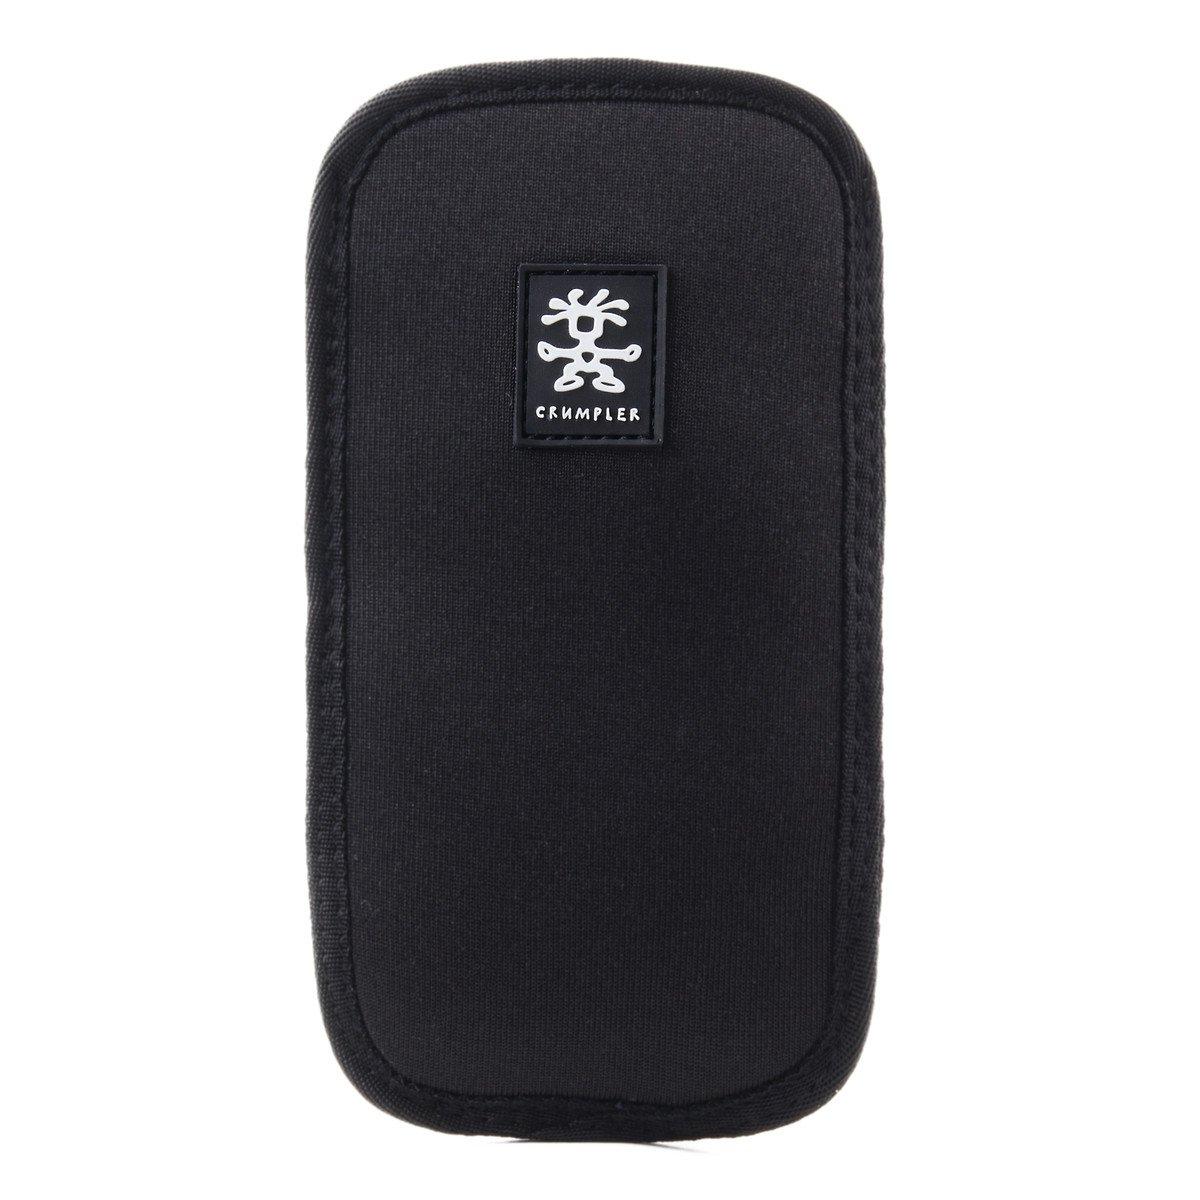 CRUMPLER Base Layer Smart Phone 85